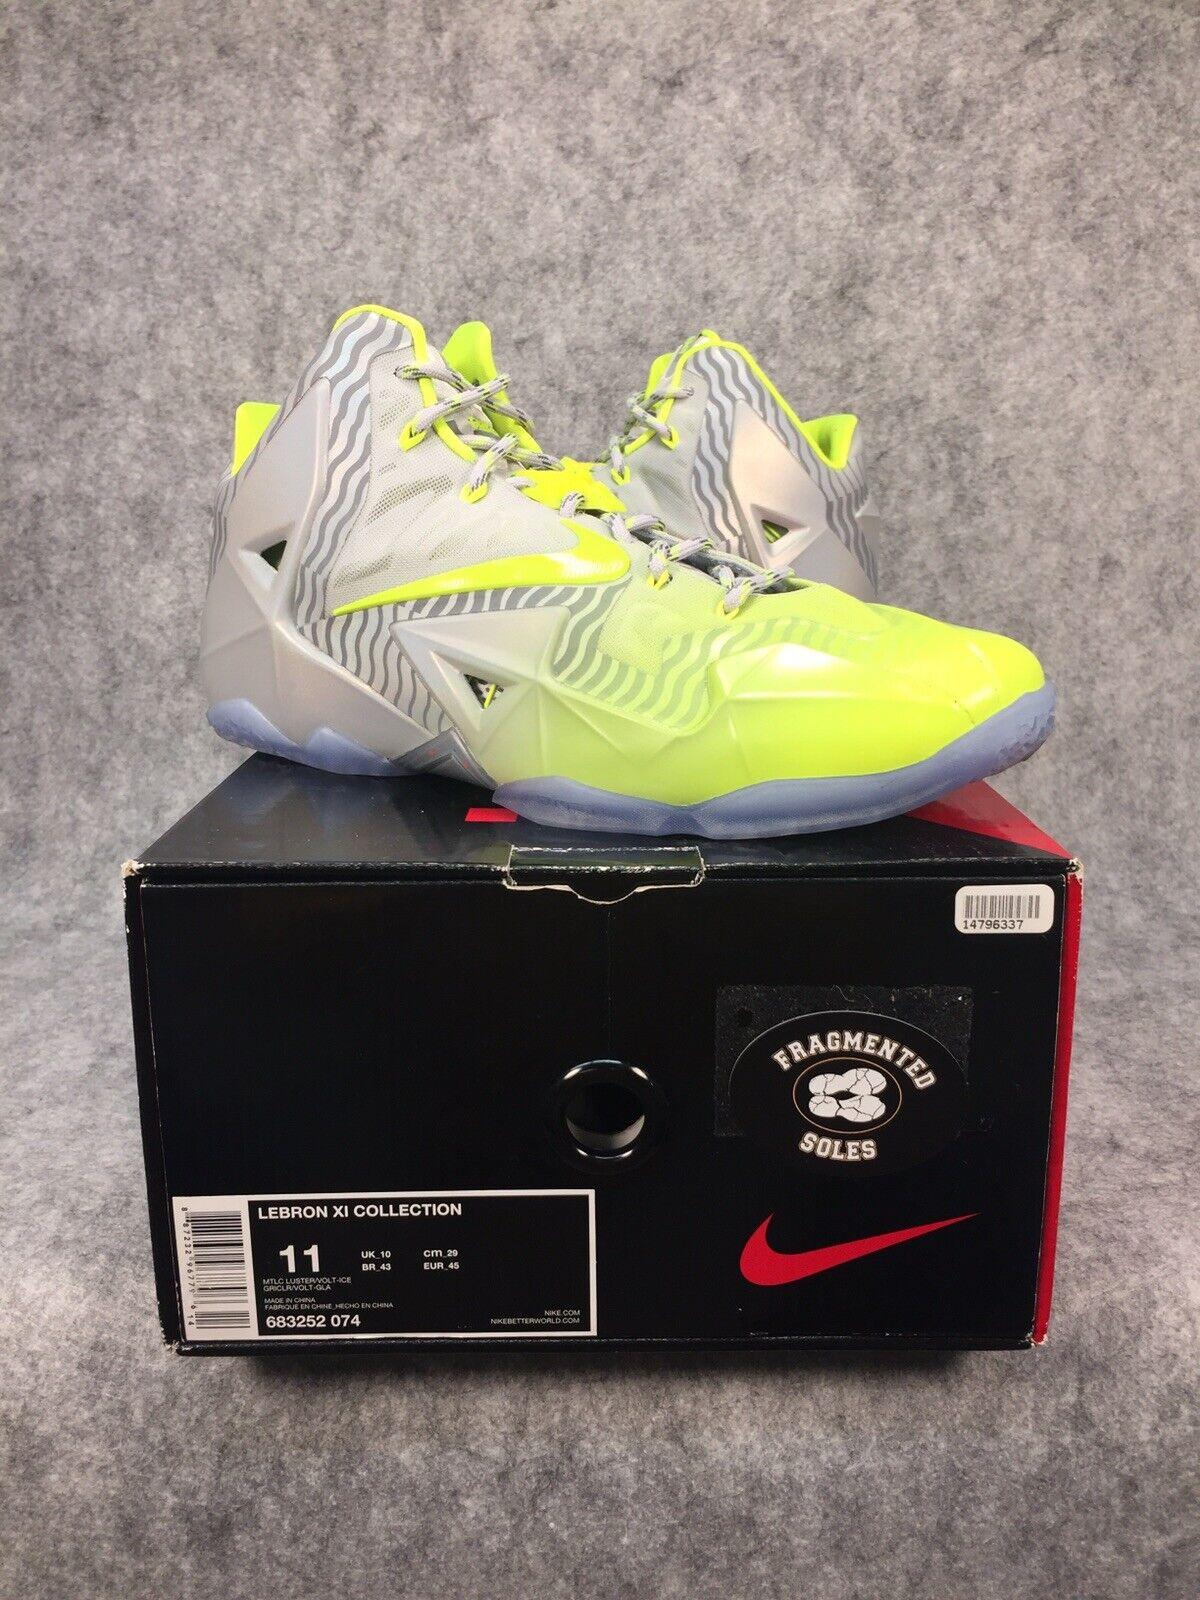 Nike Lebron 11 Maison Du Mens Basketball shoes Size 11 Original Box VNDS